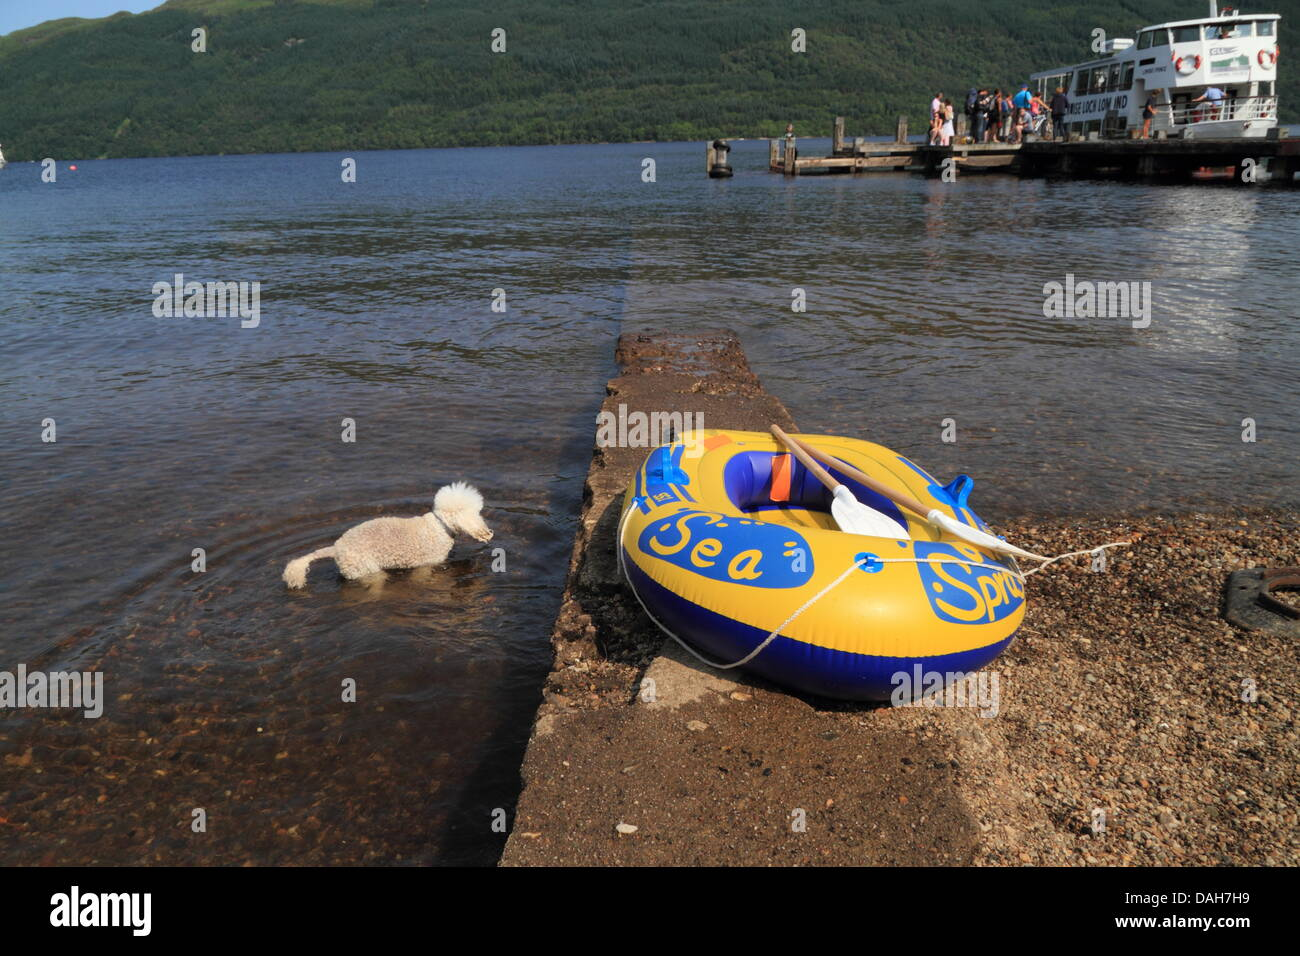 Tarbet, Loch Lomond, Scotland, UK. 13th July 2013. Children and Dogs cool off in Loch Lomond. Paul Stewart /  Alamy Stock Photo